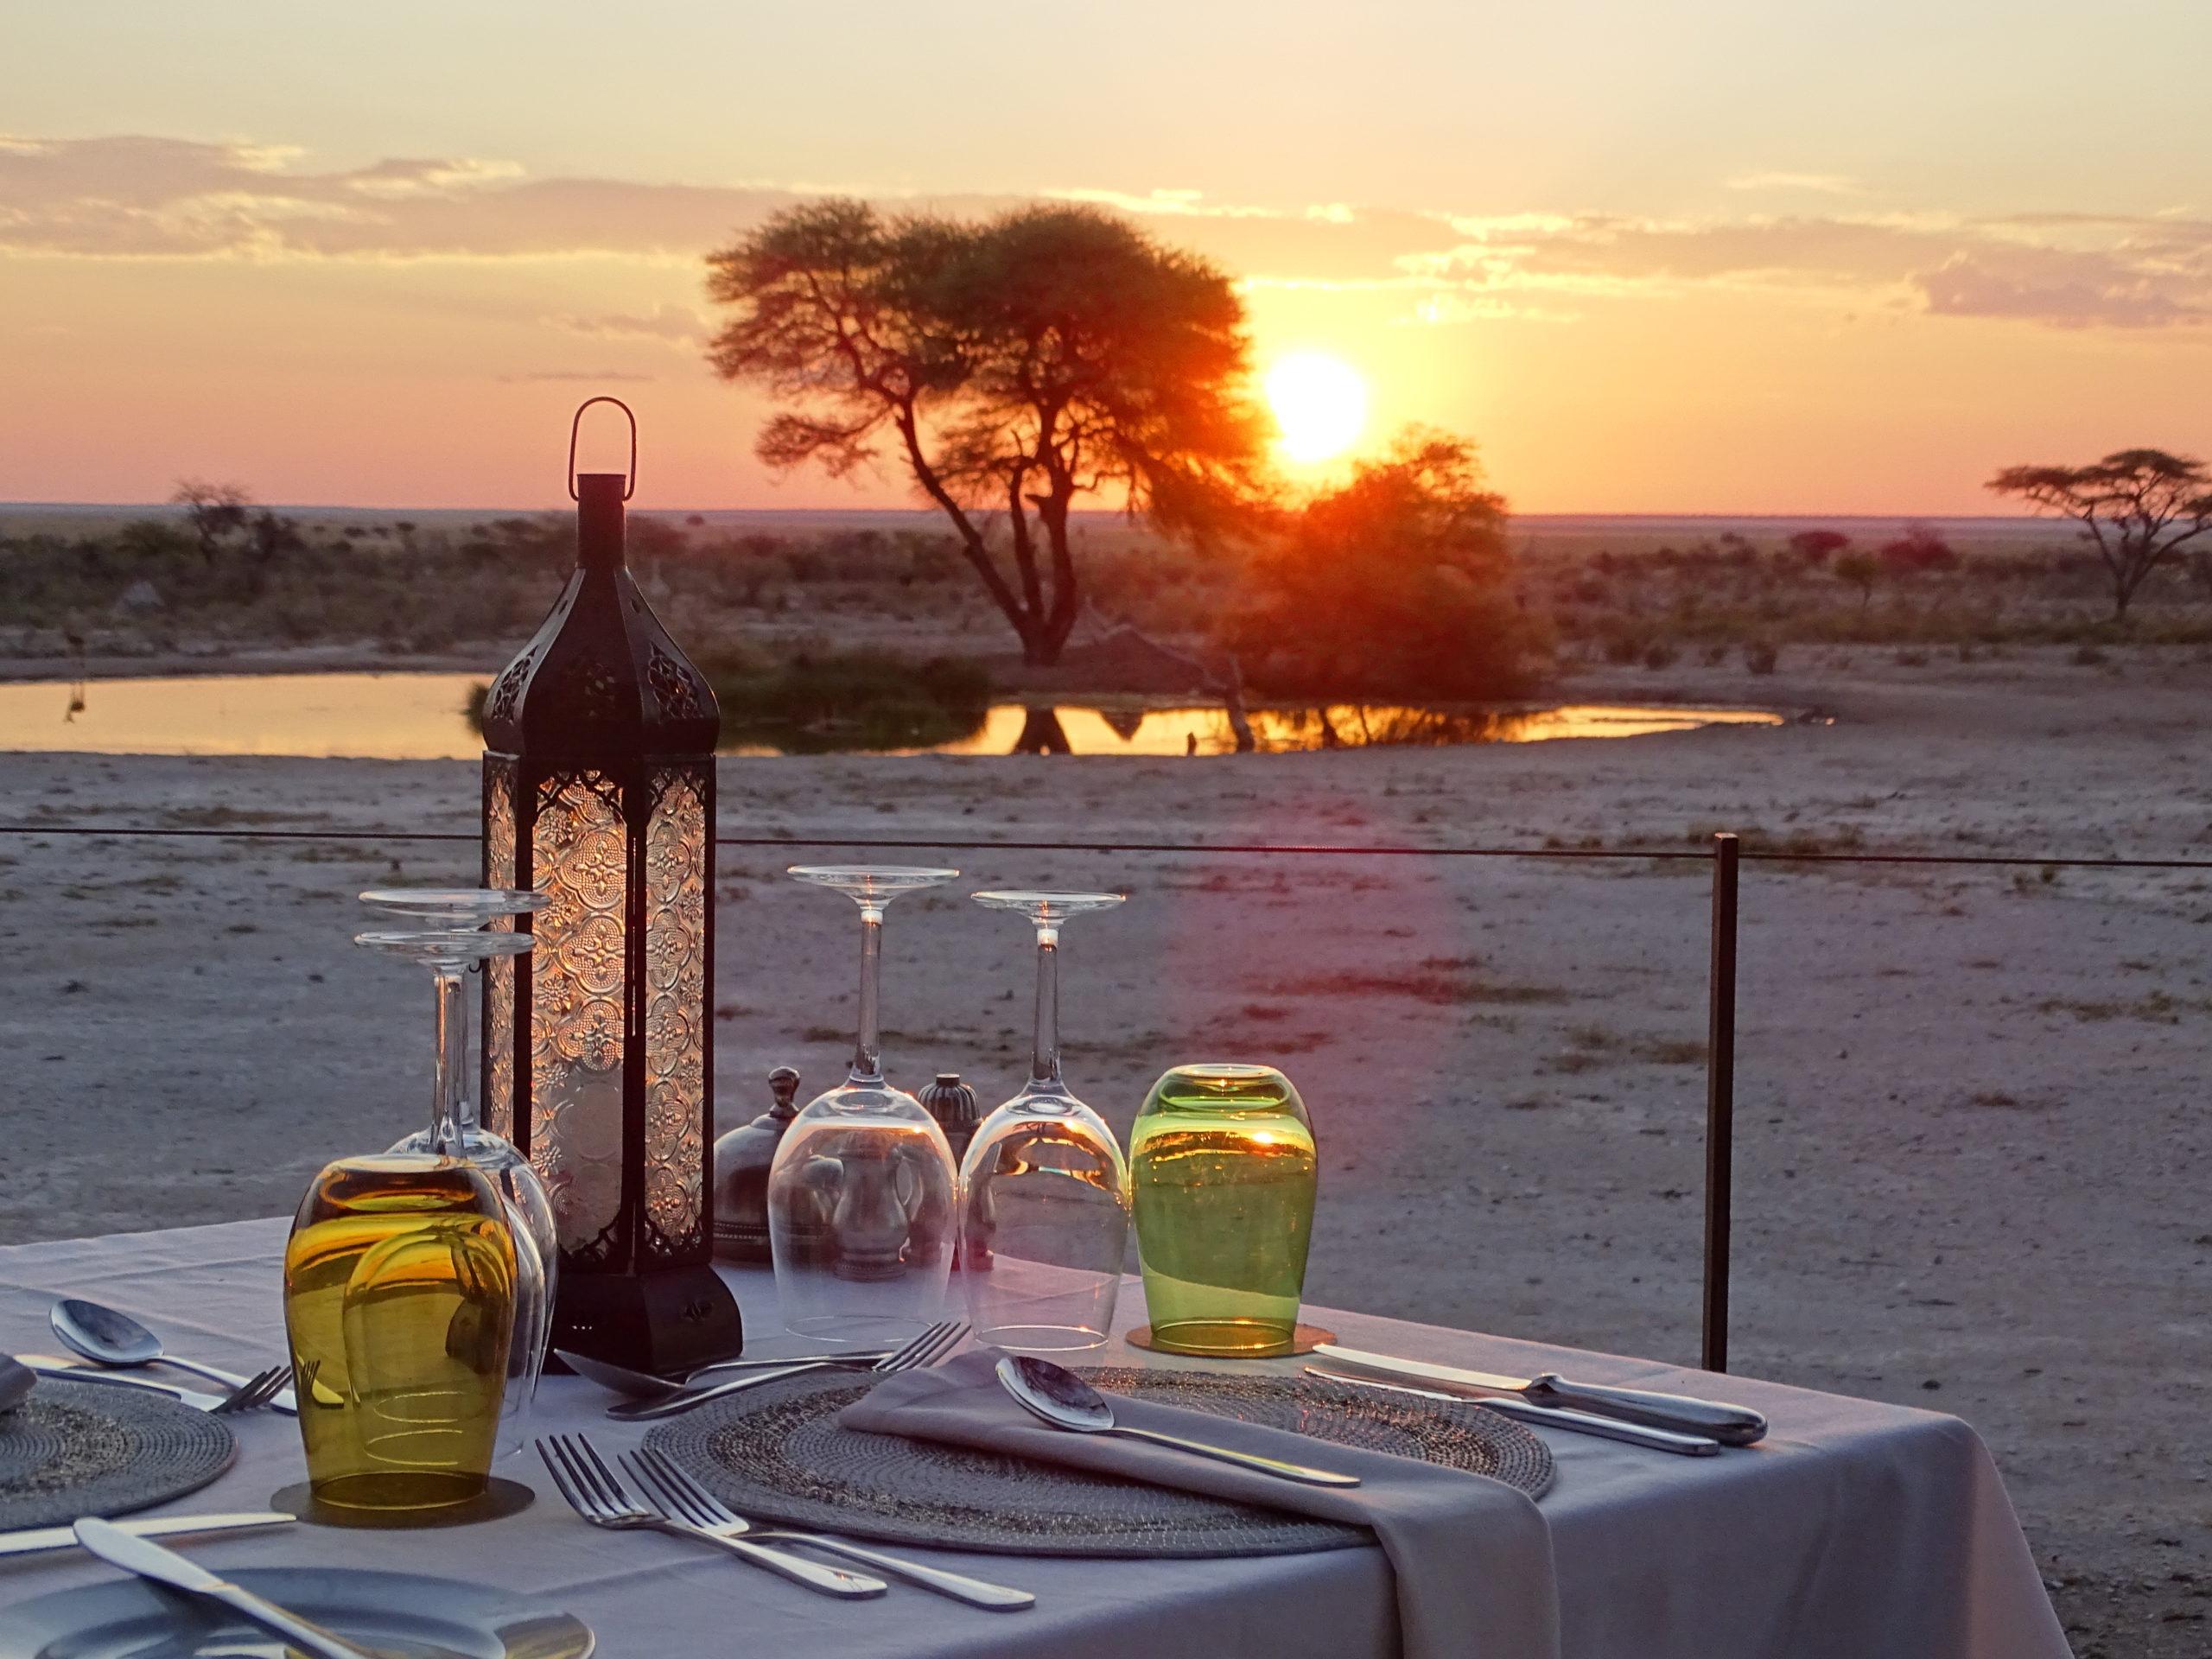 Stilvoller Sonnenuntergang in Namibia